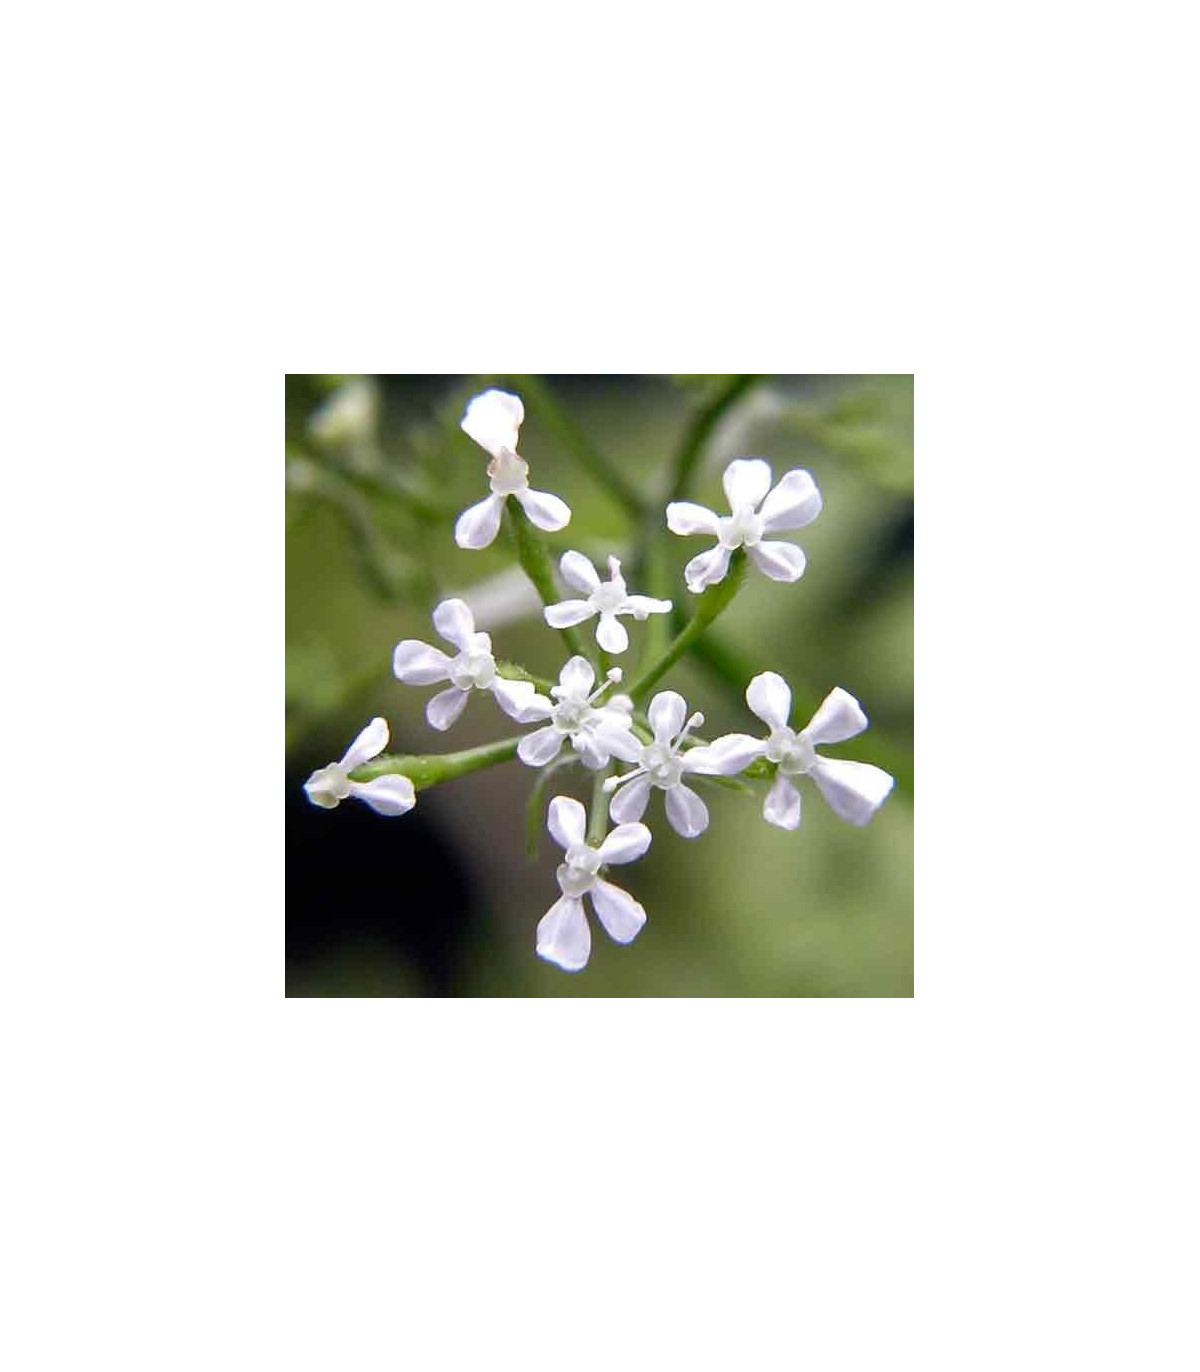 BIO Trebuľka siata - Anthriscus erefolium - semená trebuľky - semiačka - 350 ks